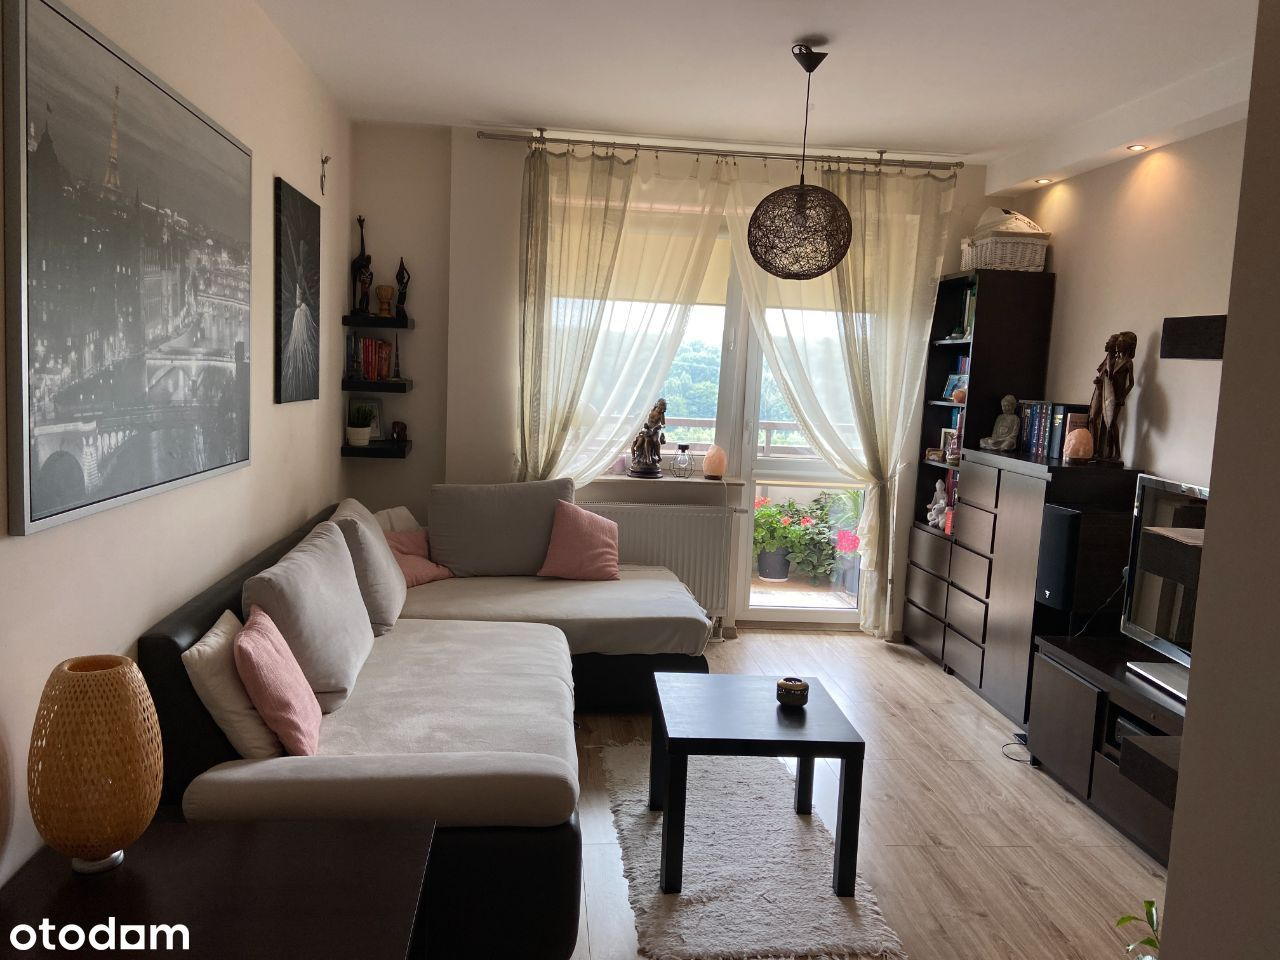 Mieszkanie blisko lasu - Lublin, Czuby, Poręba